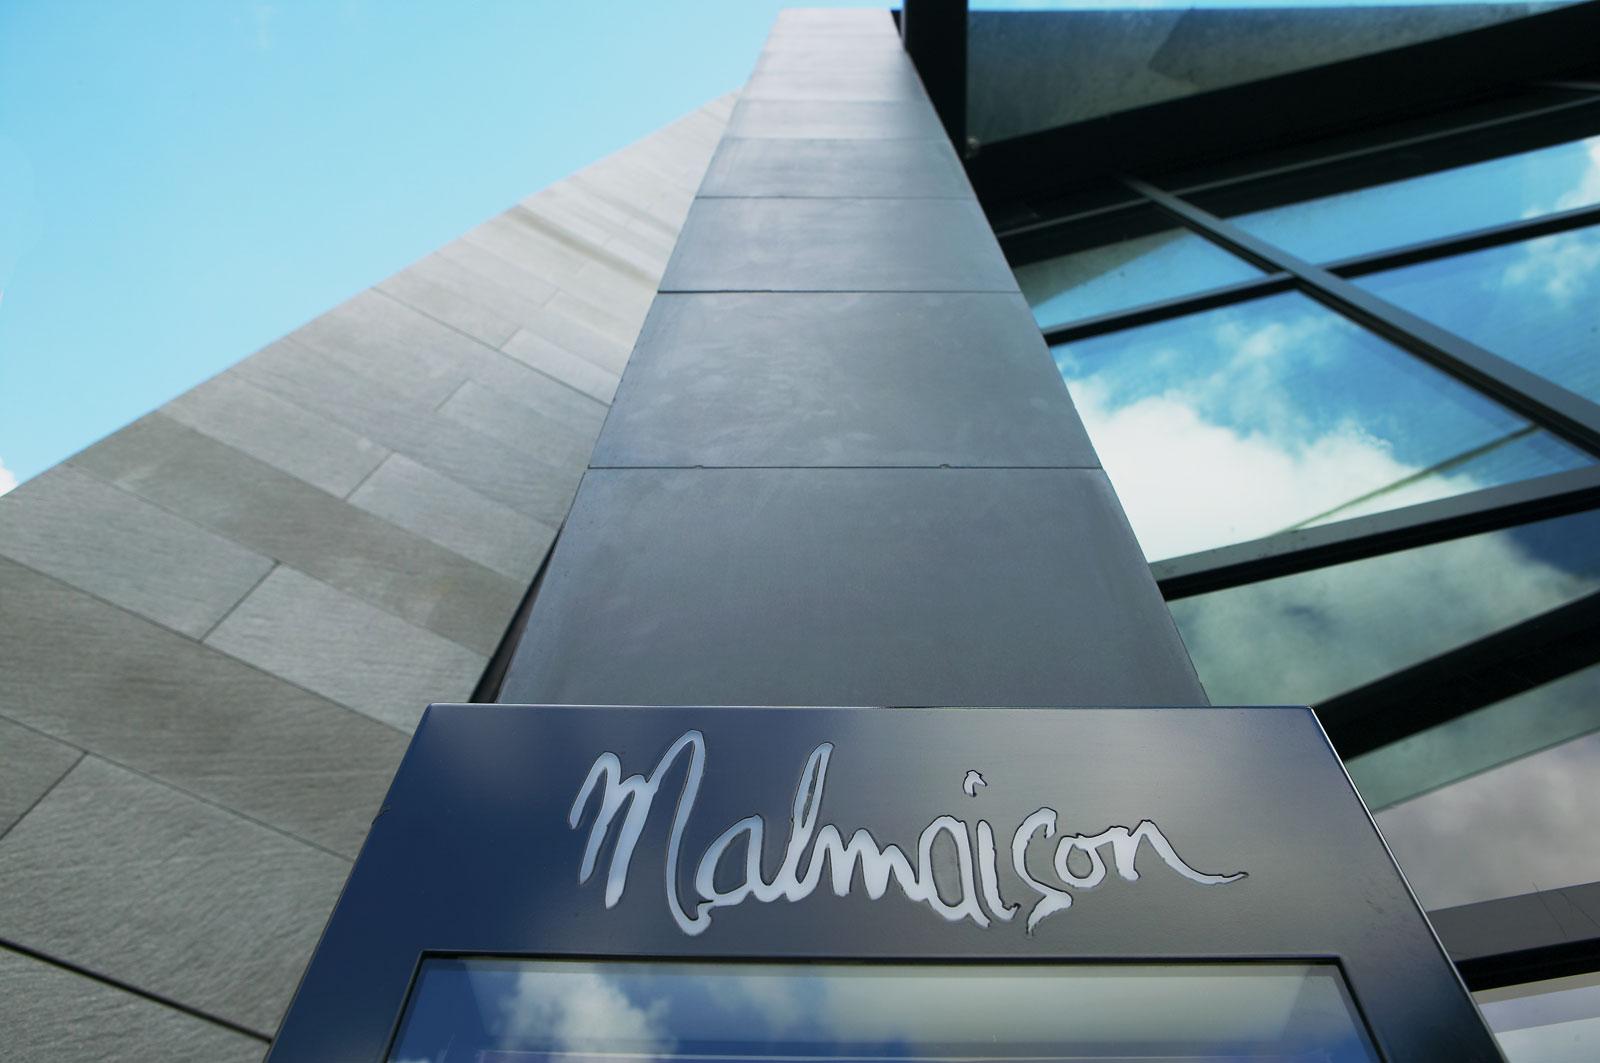 Malmaison Hotel, Liverpool | Hotel Photographer